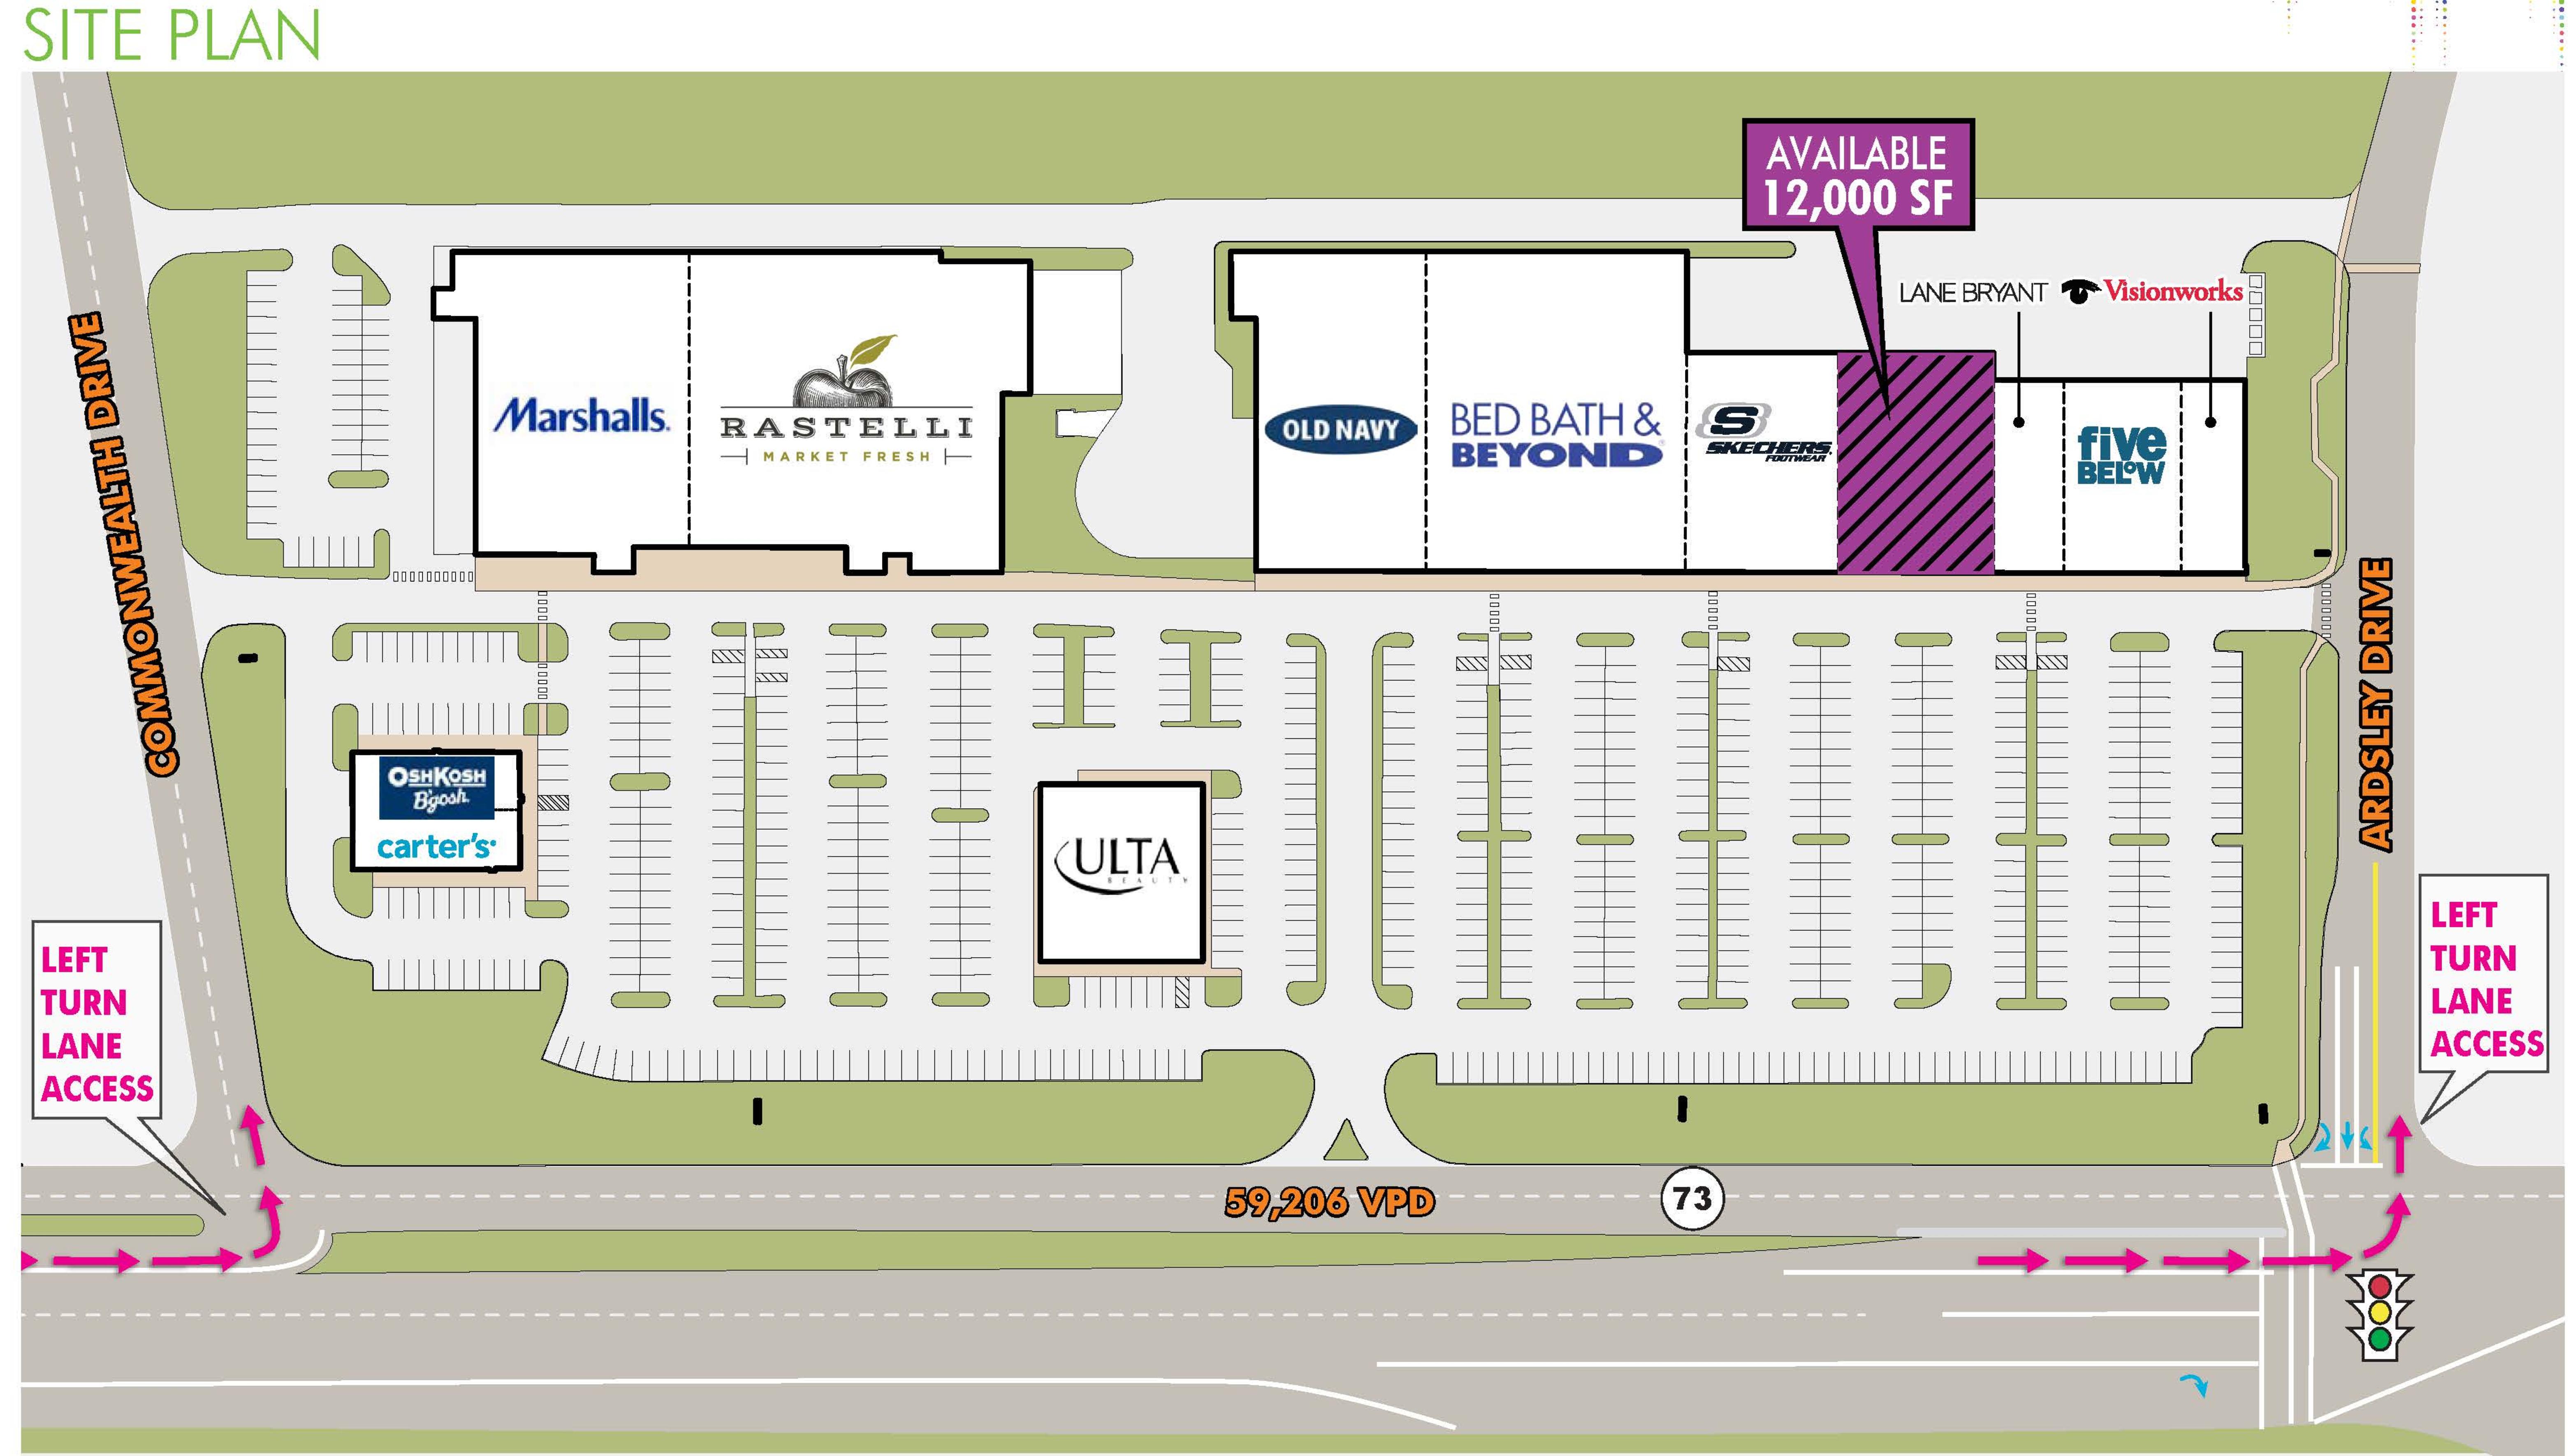 Willow Ridge Plaza: site plan